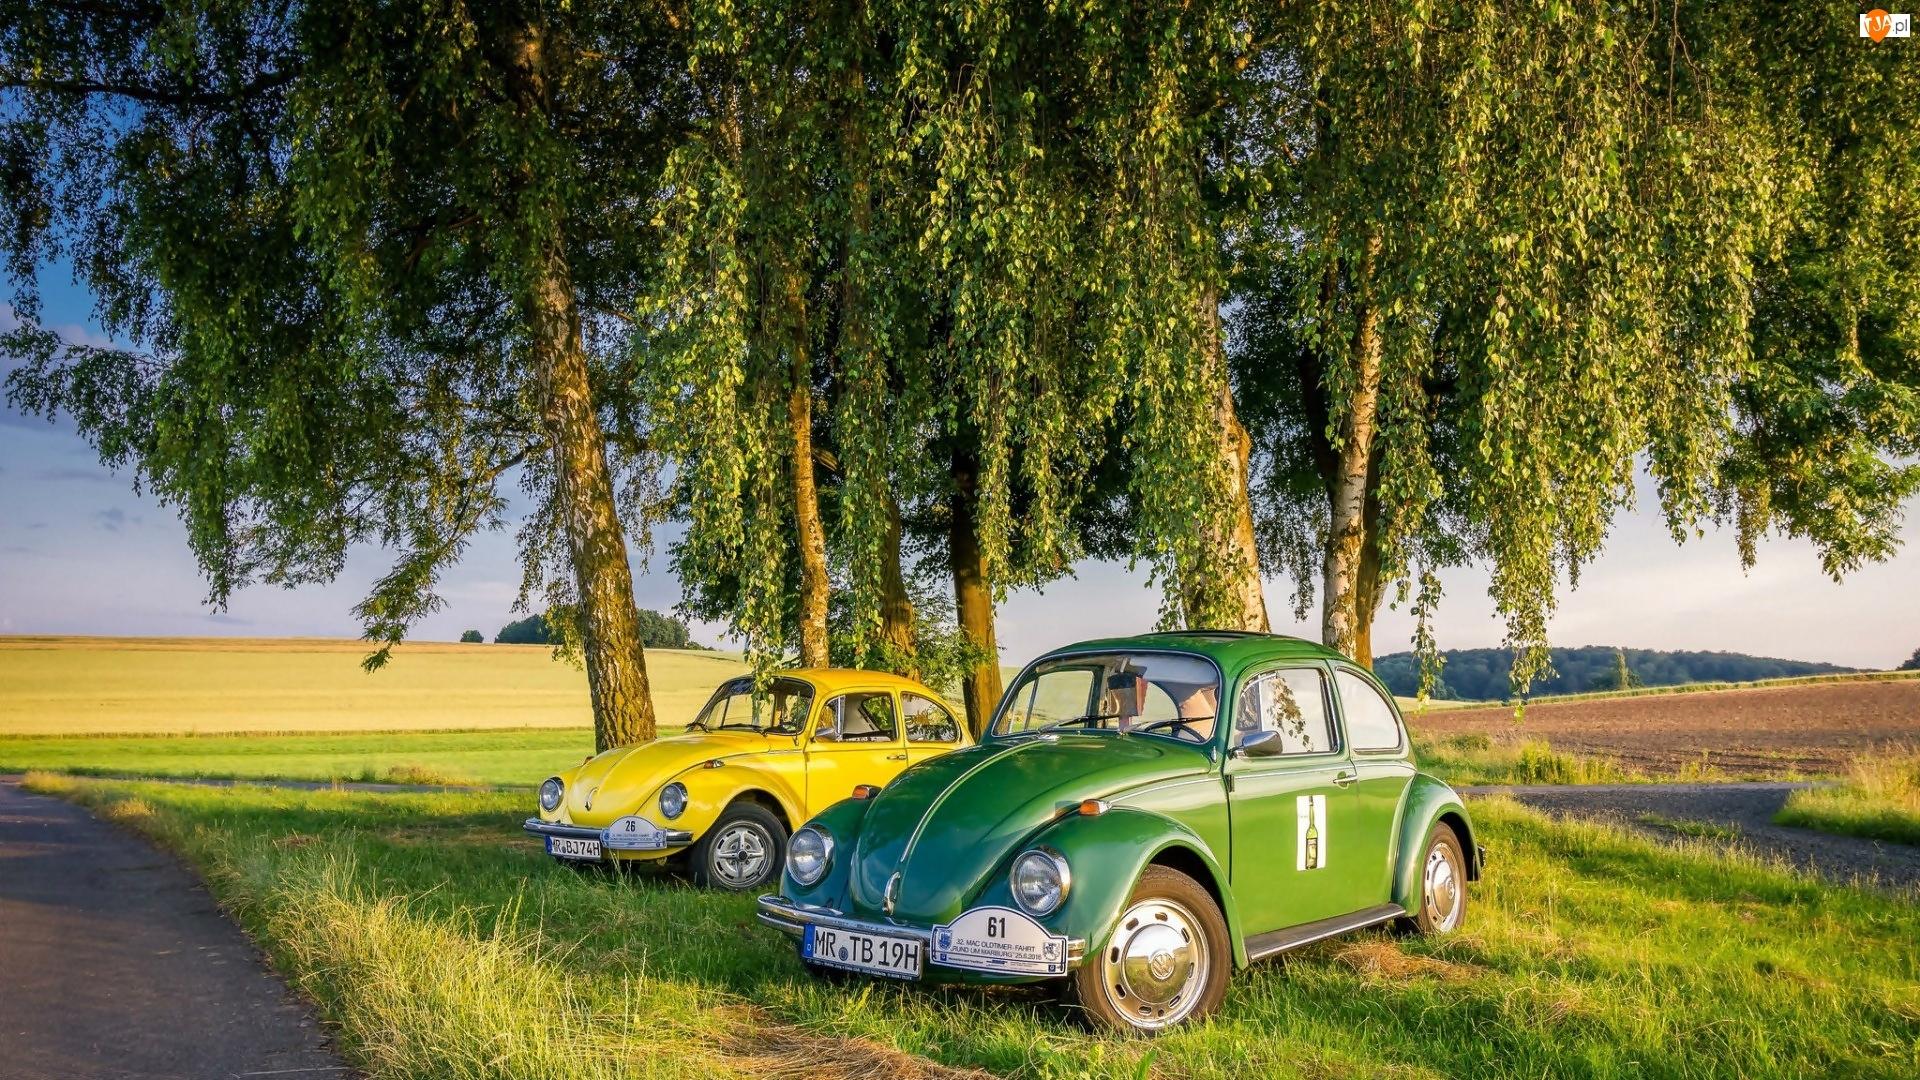 Garbus, Pola, Samochody, Droga, Volkswagen, Brzozy